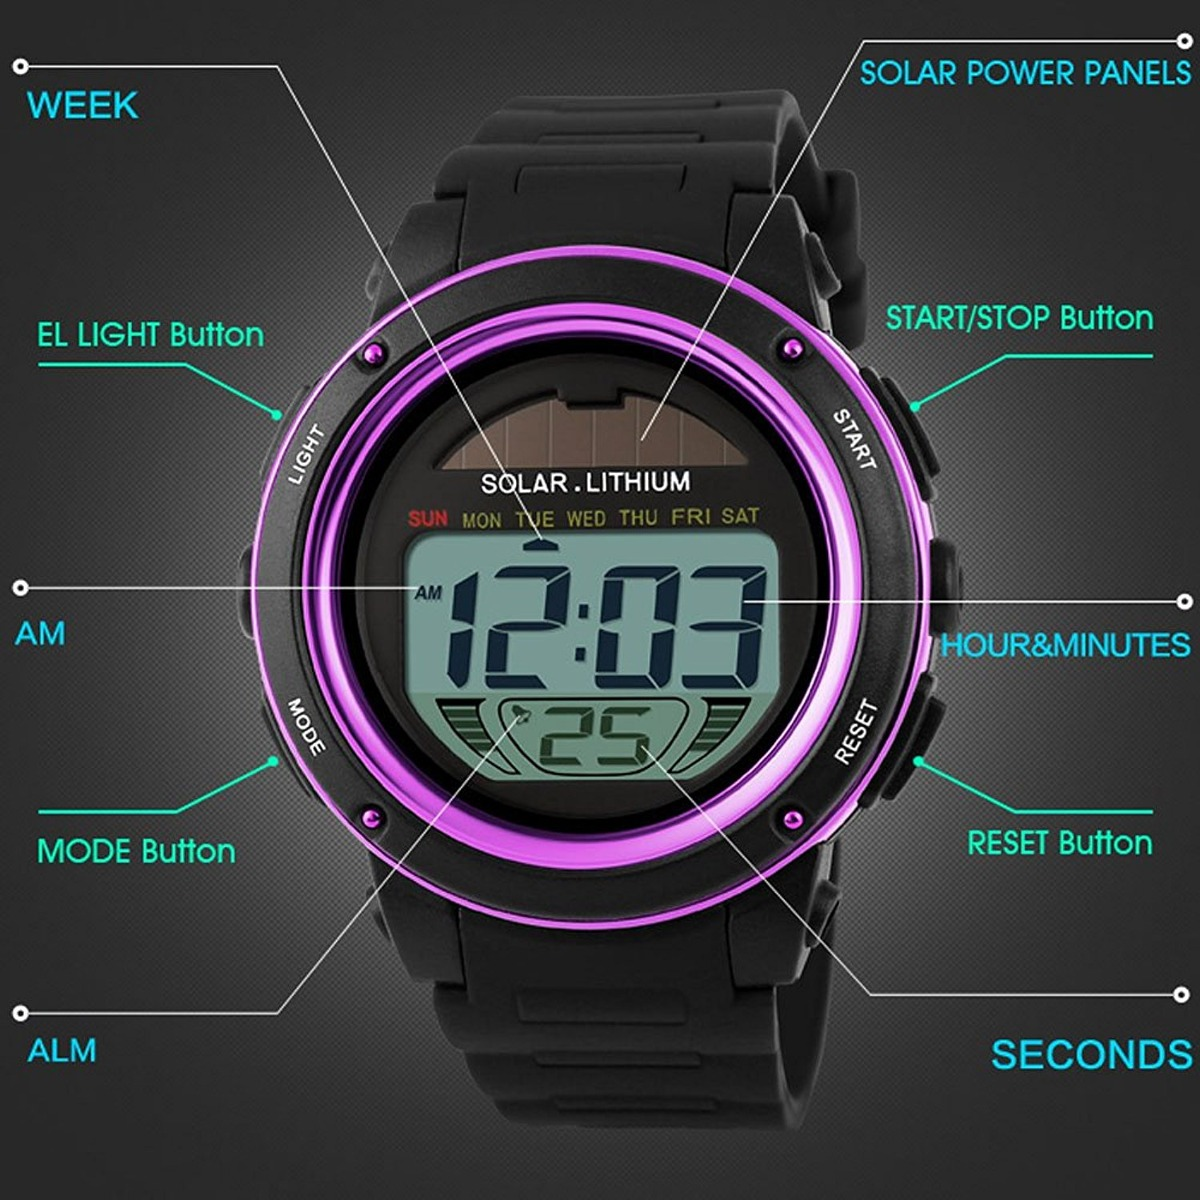 mastop reloj energía solar para mujer deportivos para niñas. Cargando zoom...  reloj mujer deportivos. Cargando zoom. 059b9e82f677